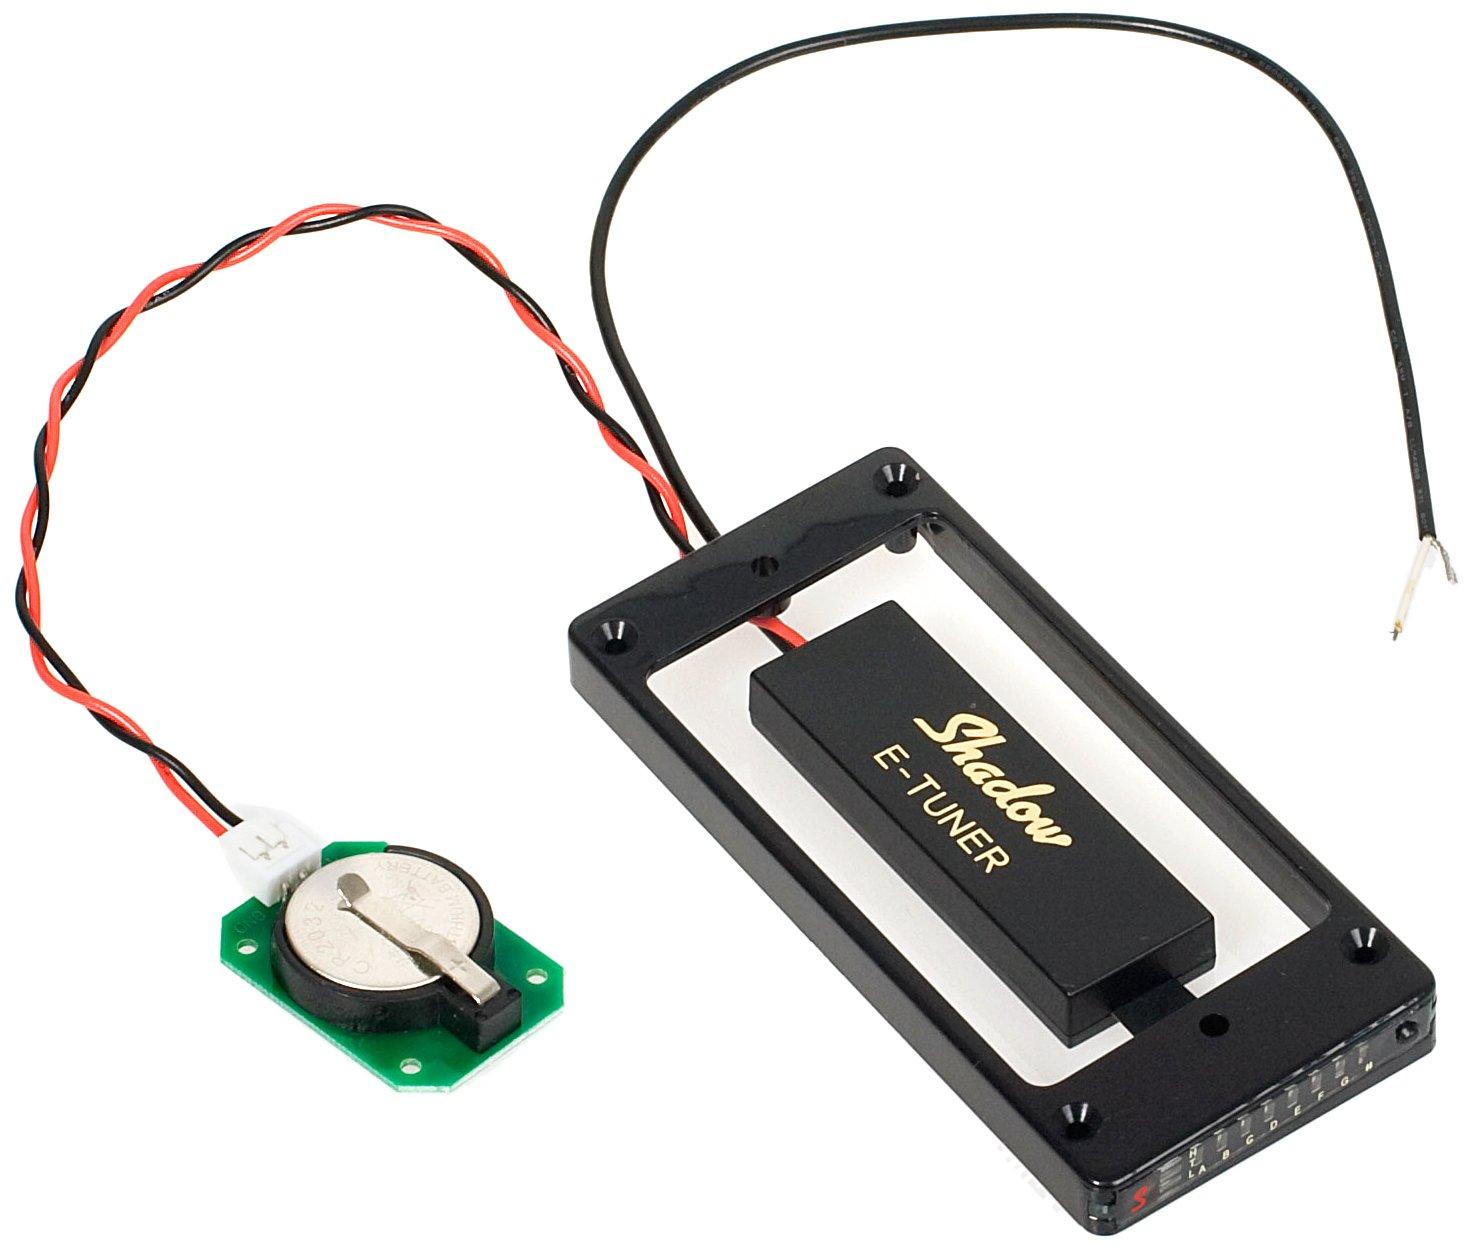 Shadow SH-HBTCT-BK Humbucker Frame Tuner, Black for Curved Top Guitars Shadow Electronics